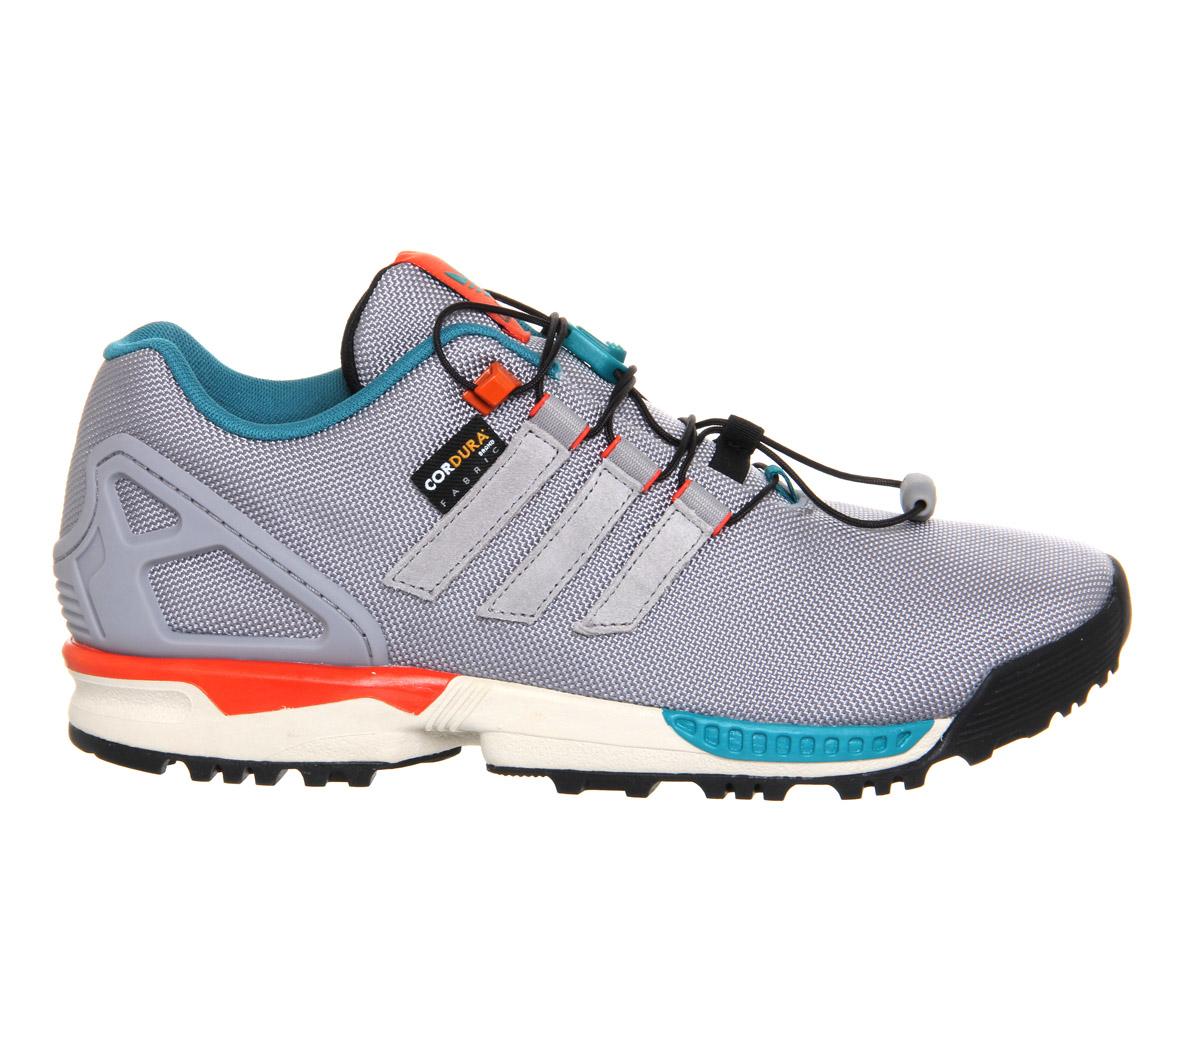 quality design ee549 072c8 Adidas Originals Gray Zx Flux Winter for men